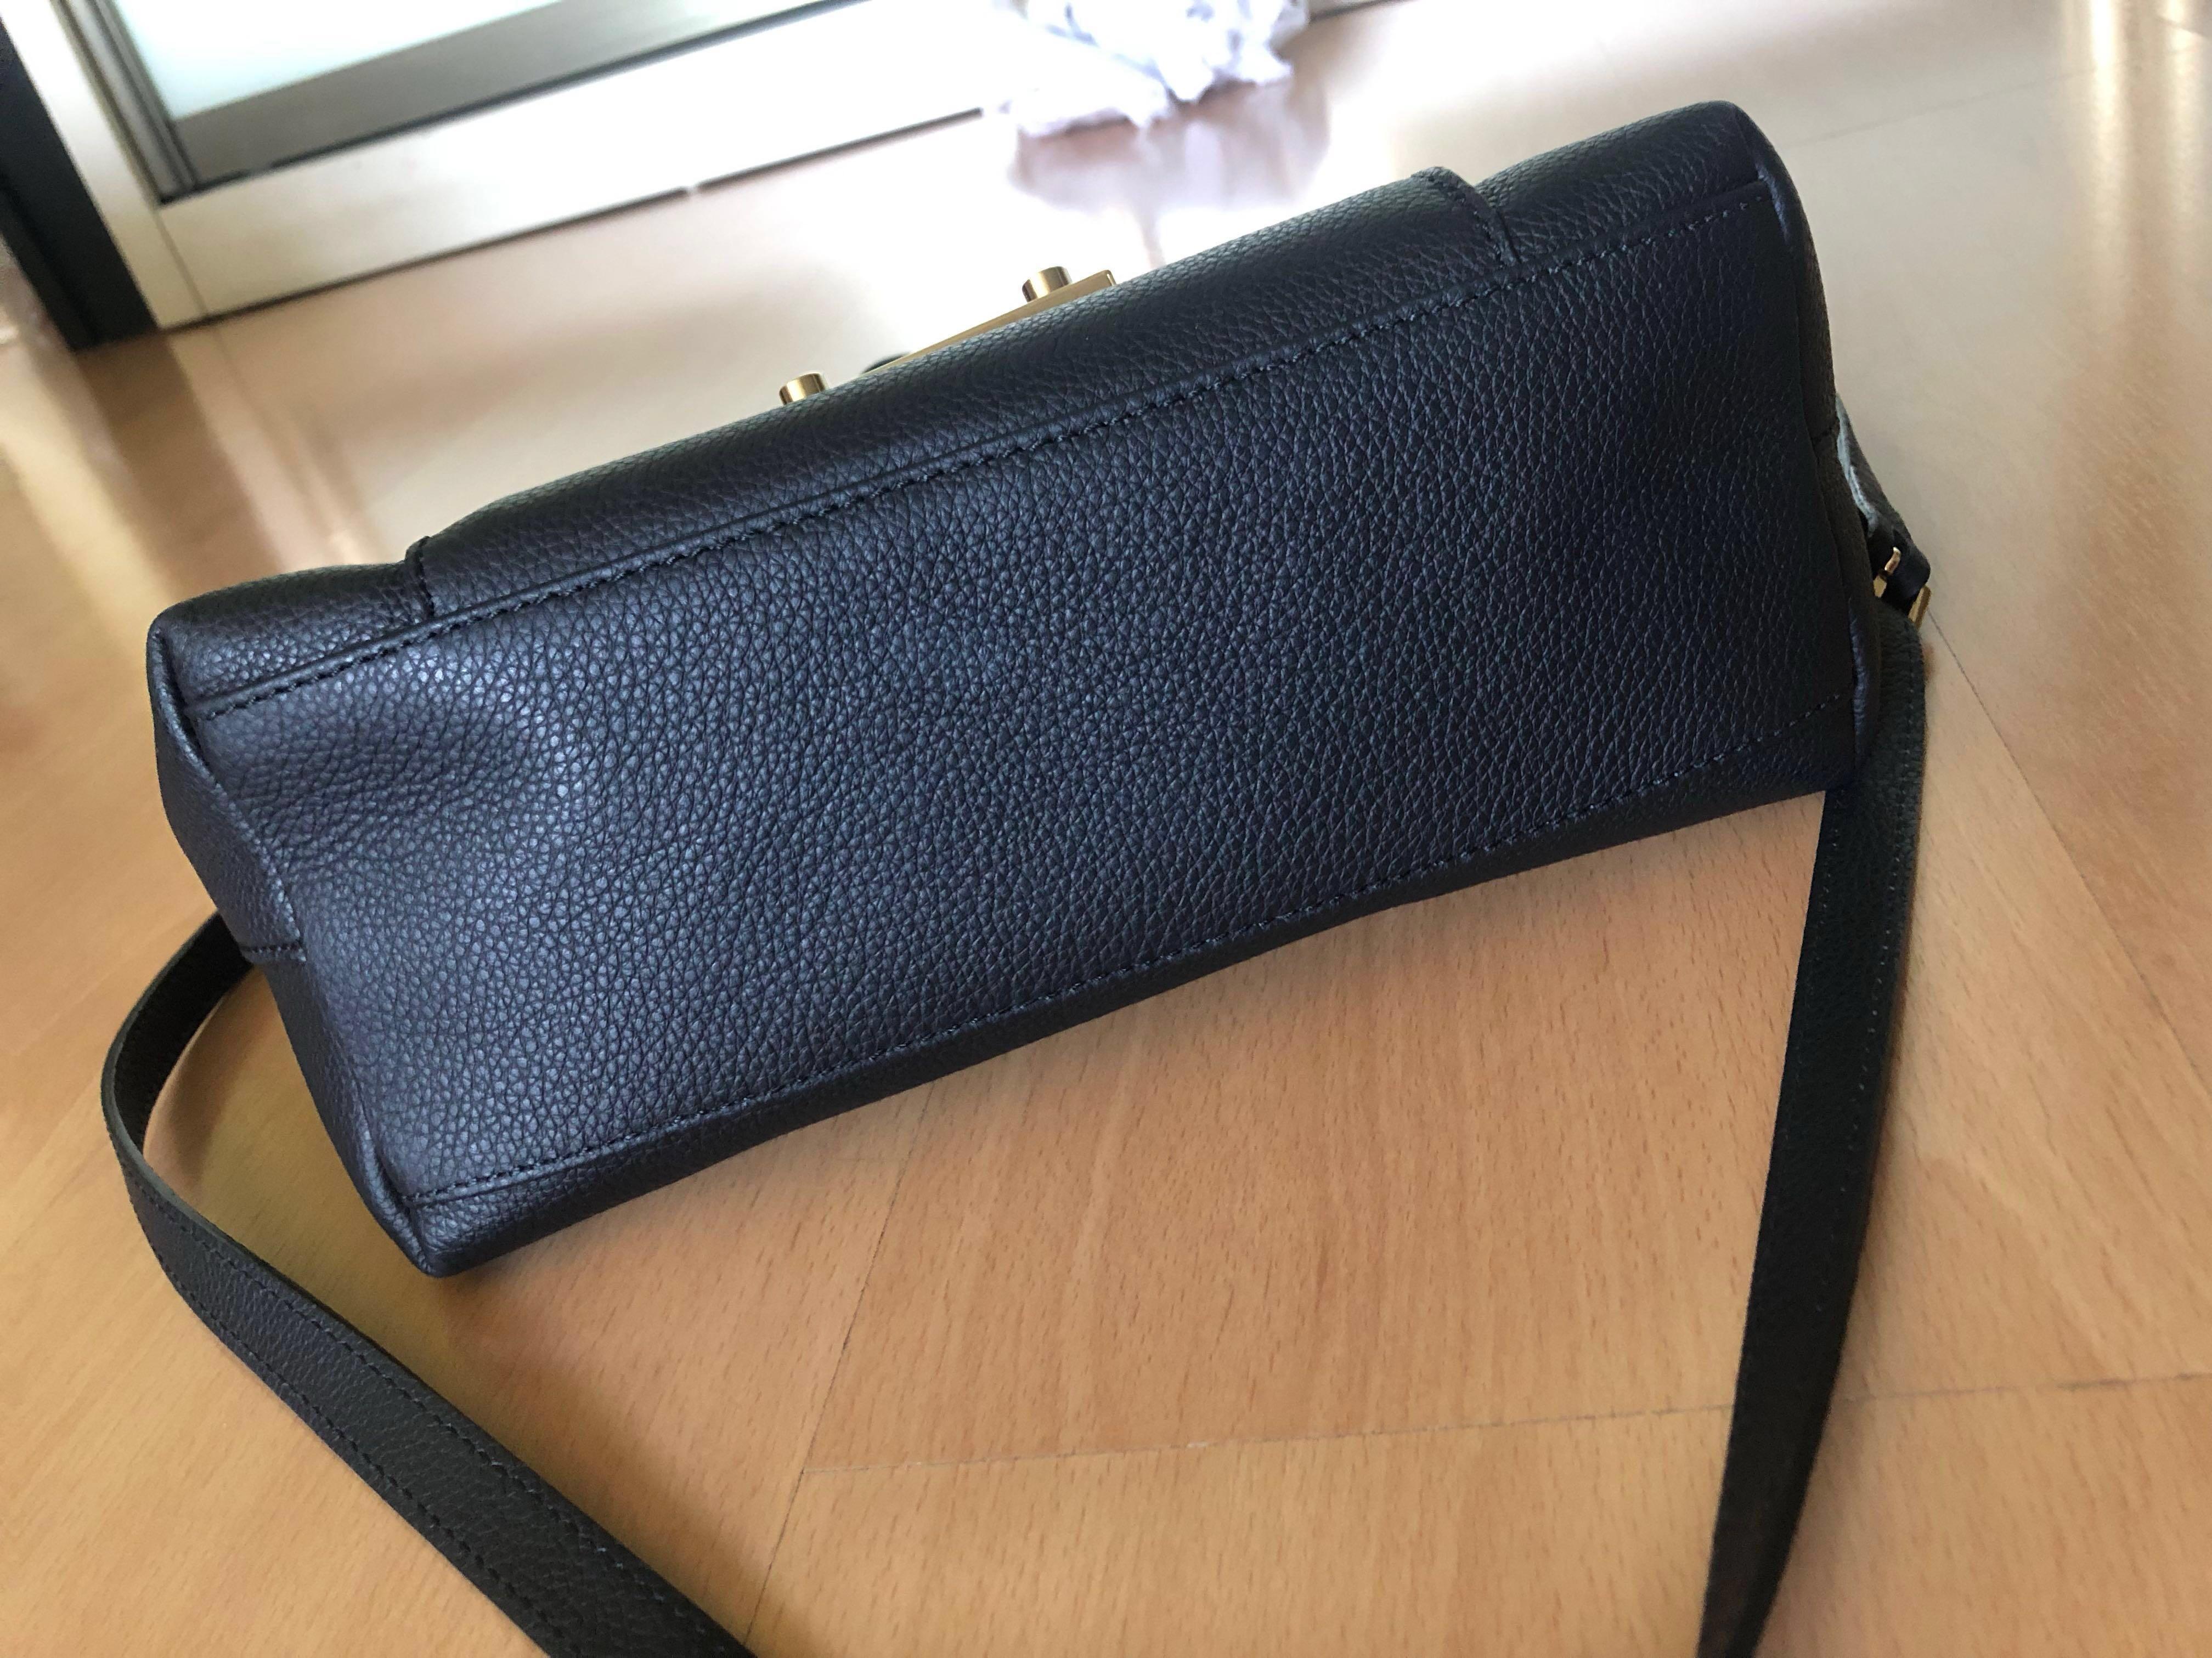 b4eff4e13 ✨Furla Julia leather work tote (Authentic) Black , Women's Fashion ...